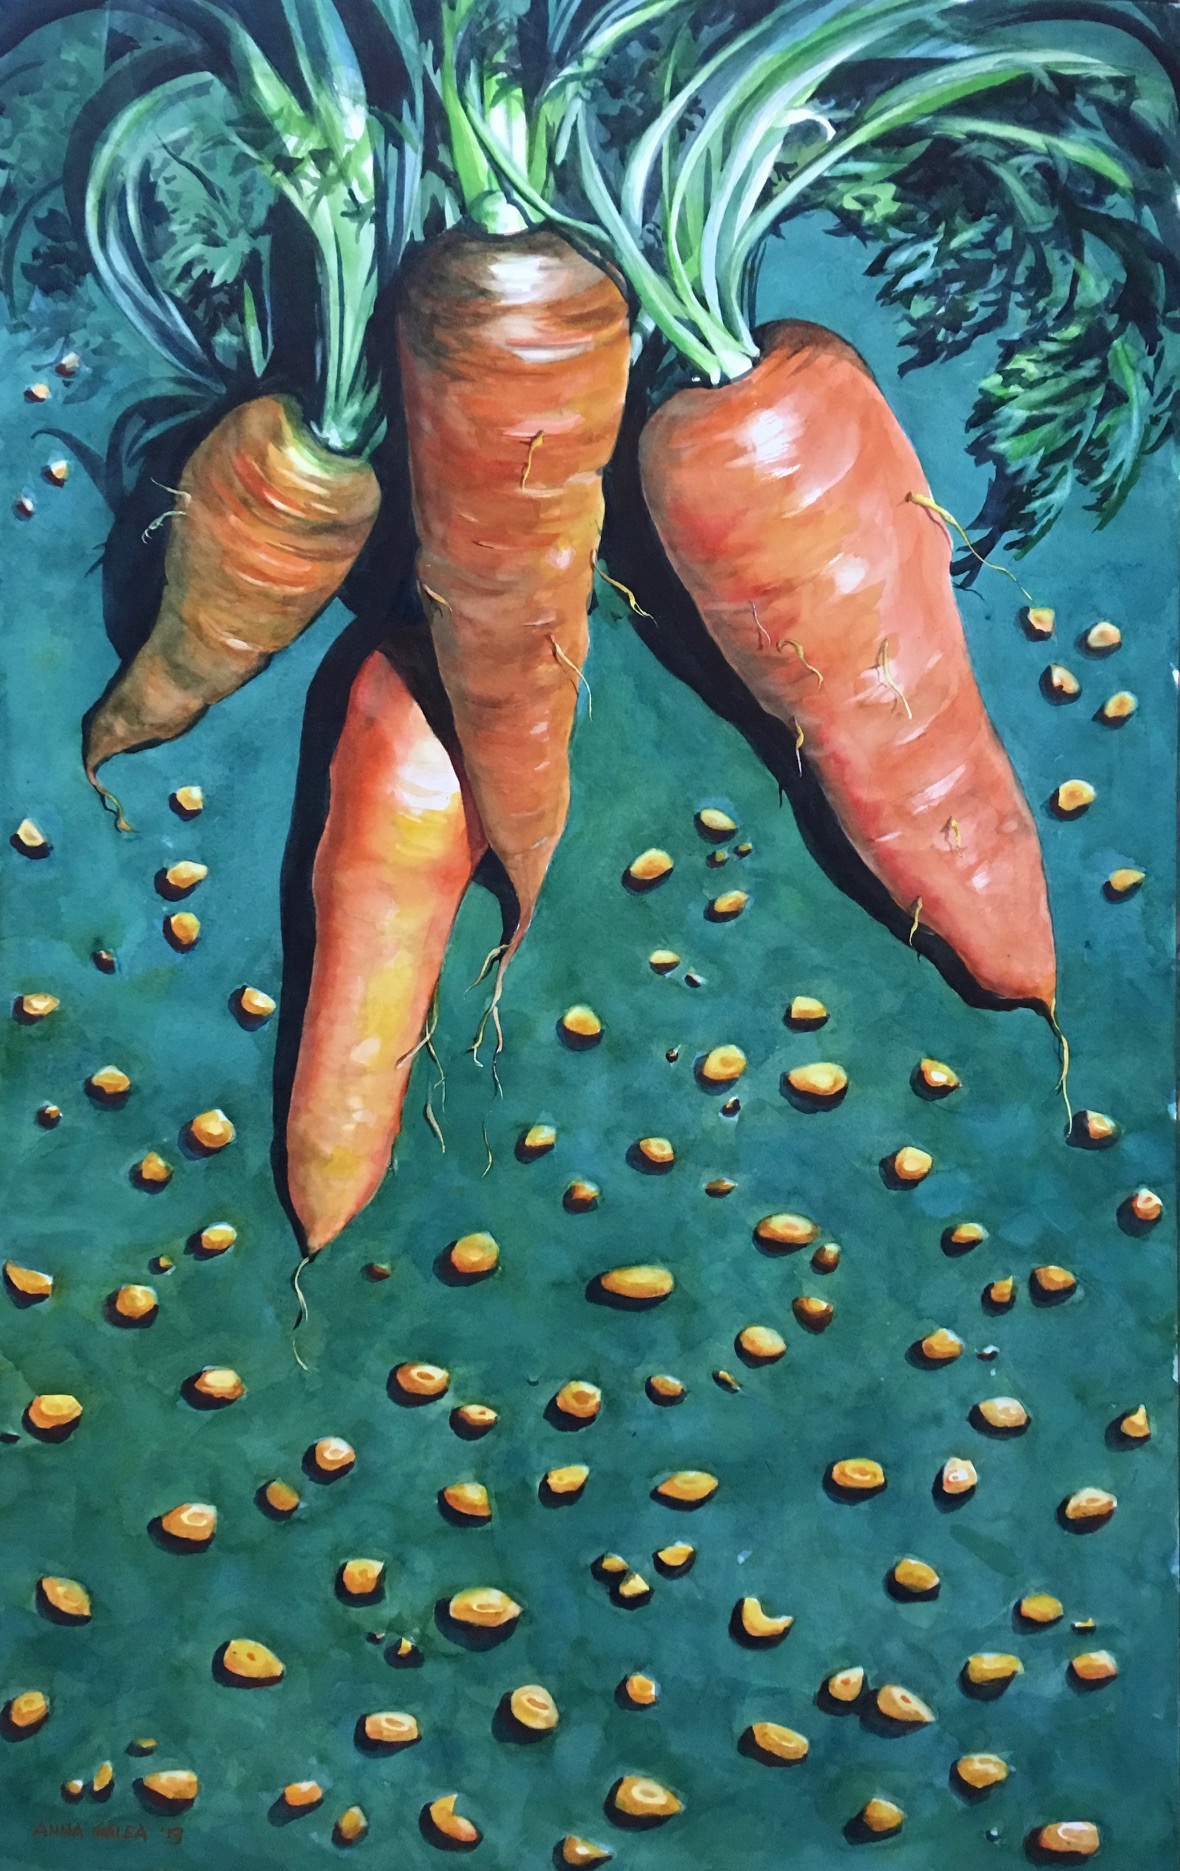 'Dangling Carrots', 2019, Watercolour, 98x62cm, Anna Galea